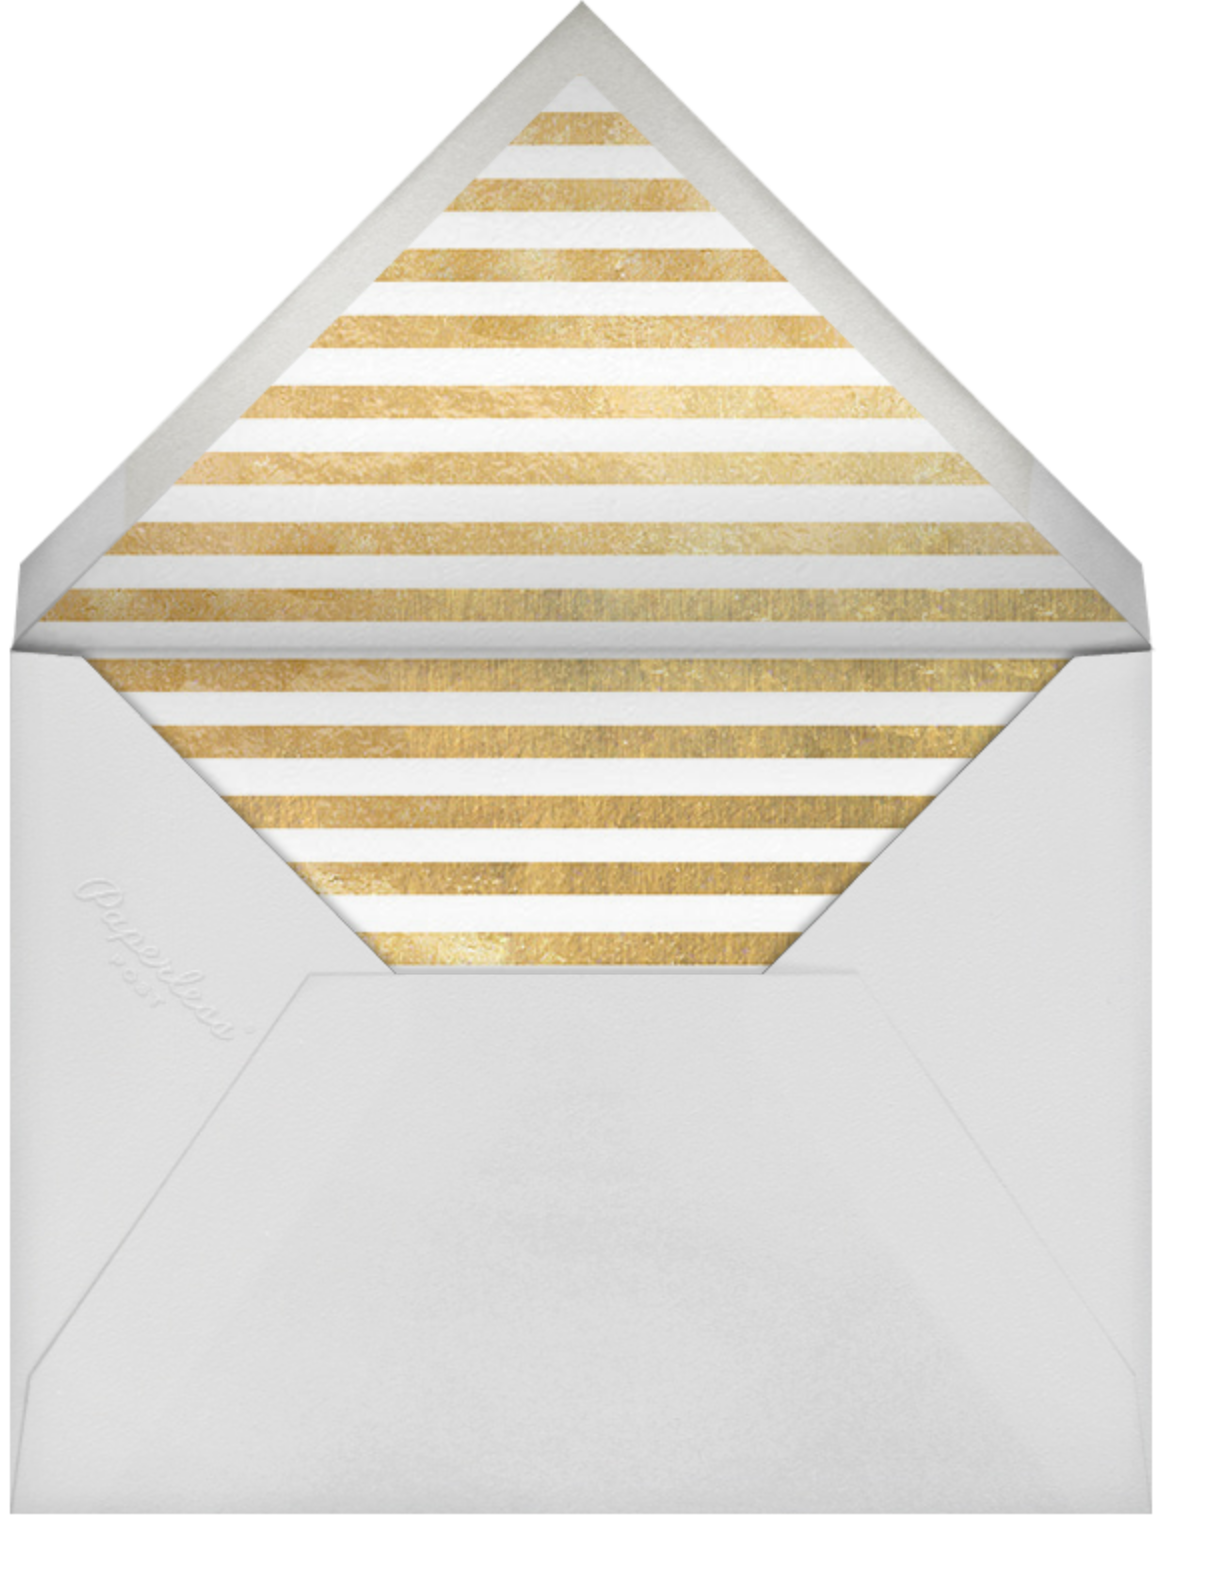 Classic Vintage - Gold/Black - kate spade new york - New Year's Eve - envelope back